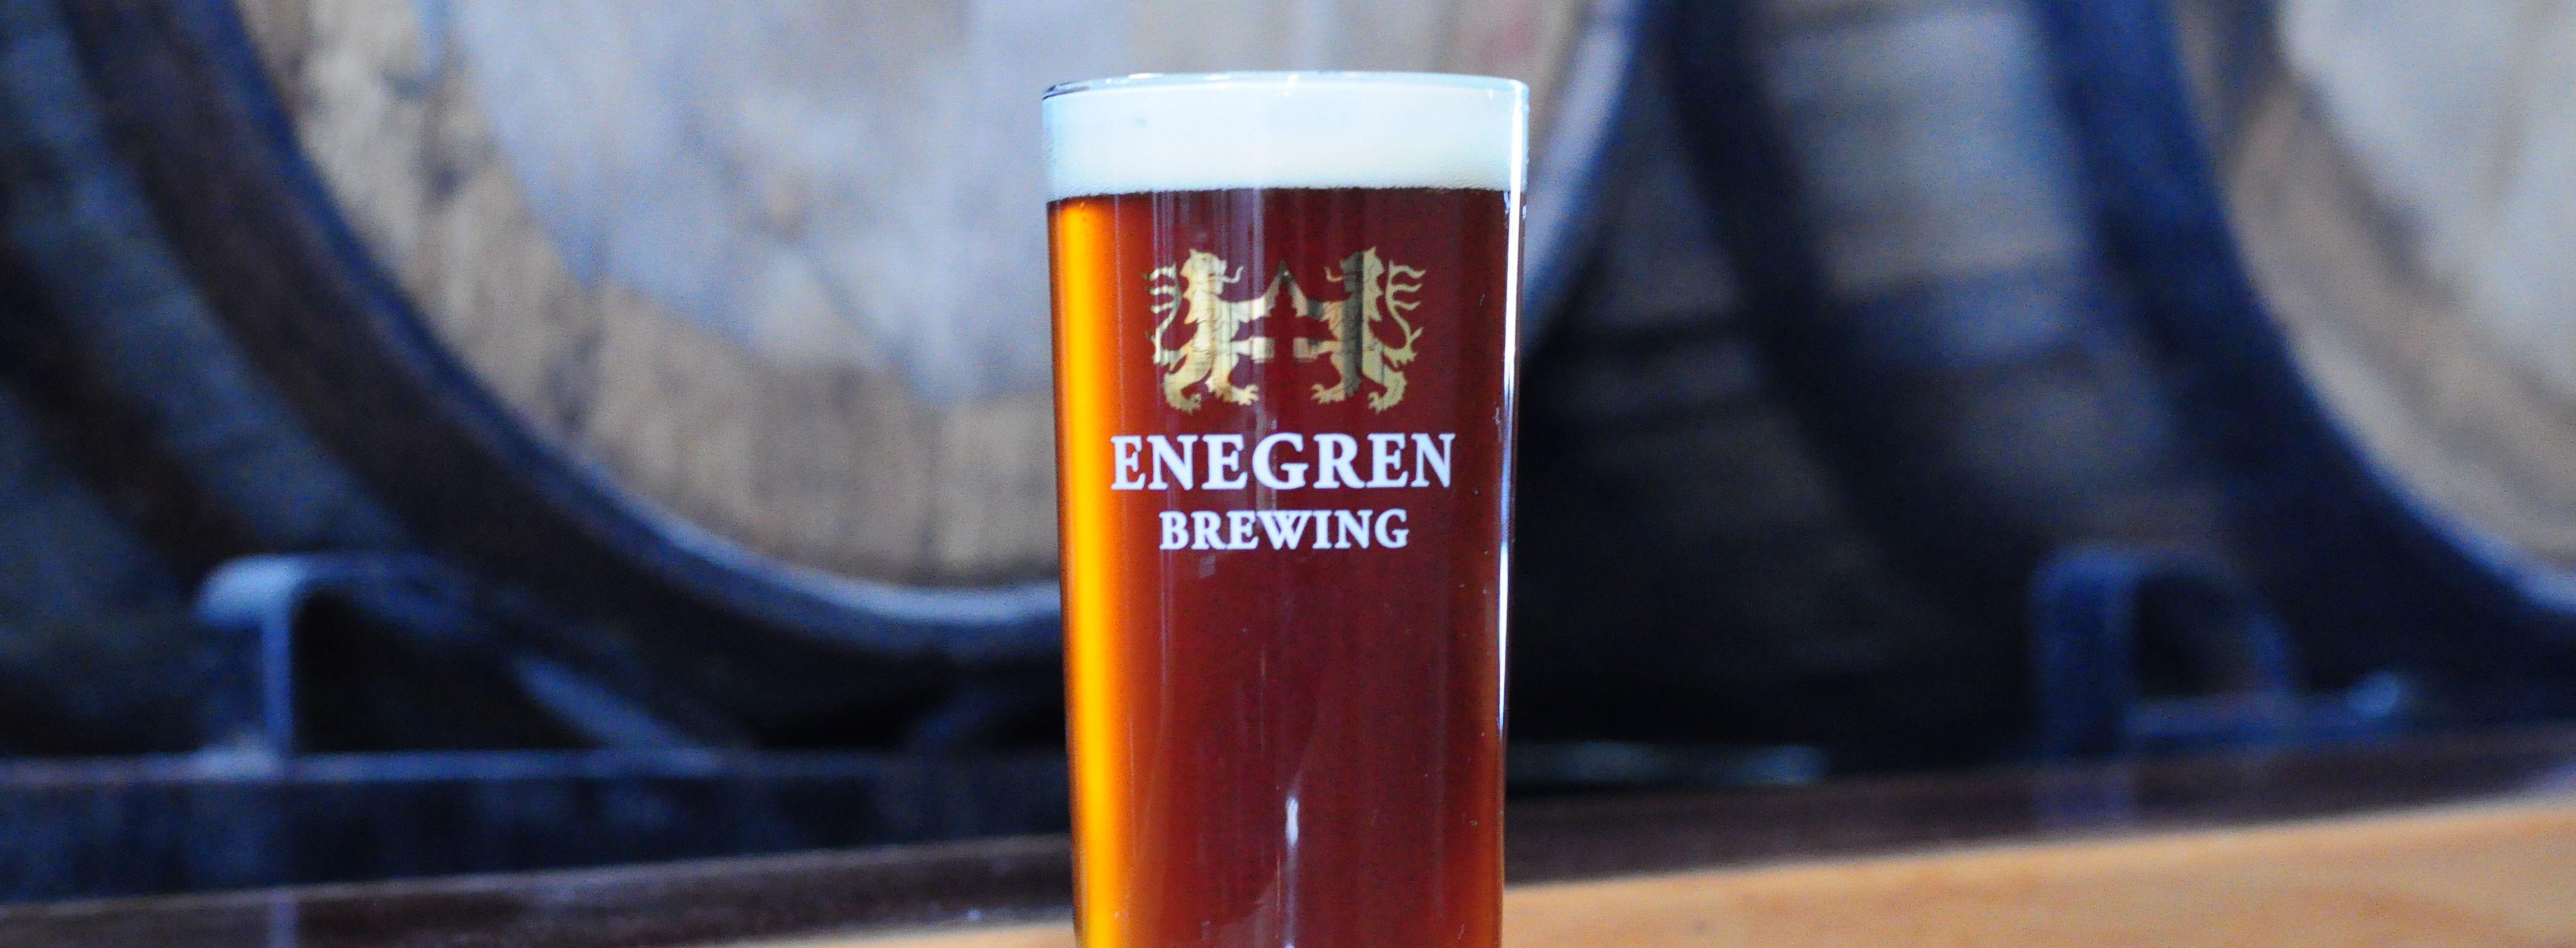 hickman english pale ale